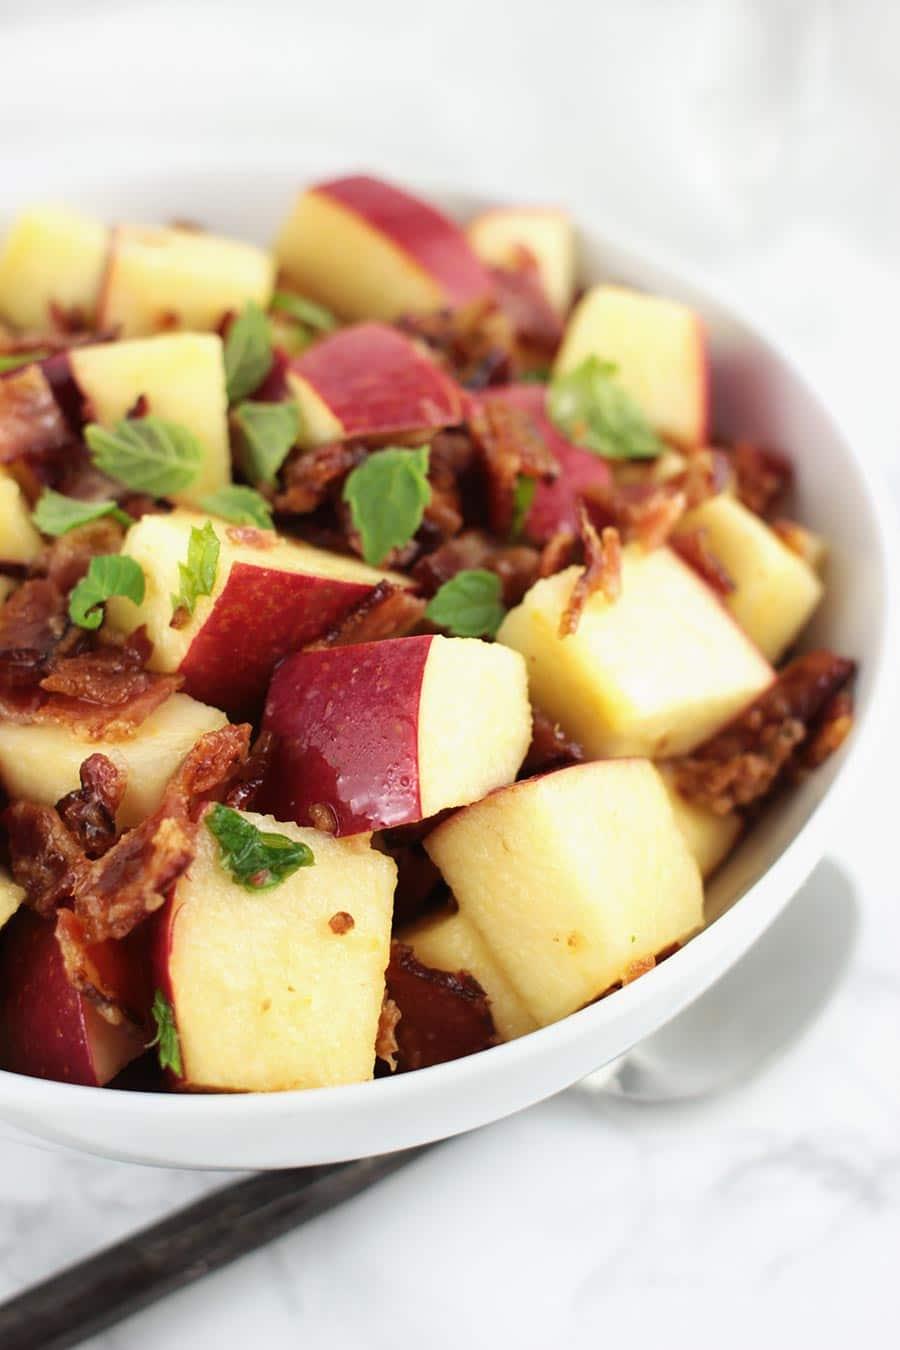 Apple Bacon Fruit Salad